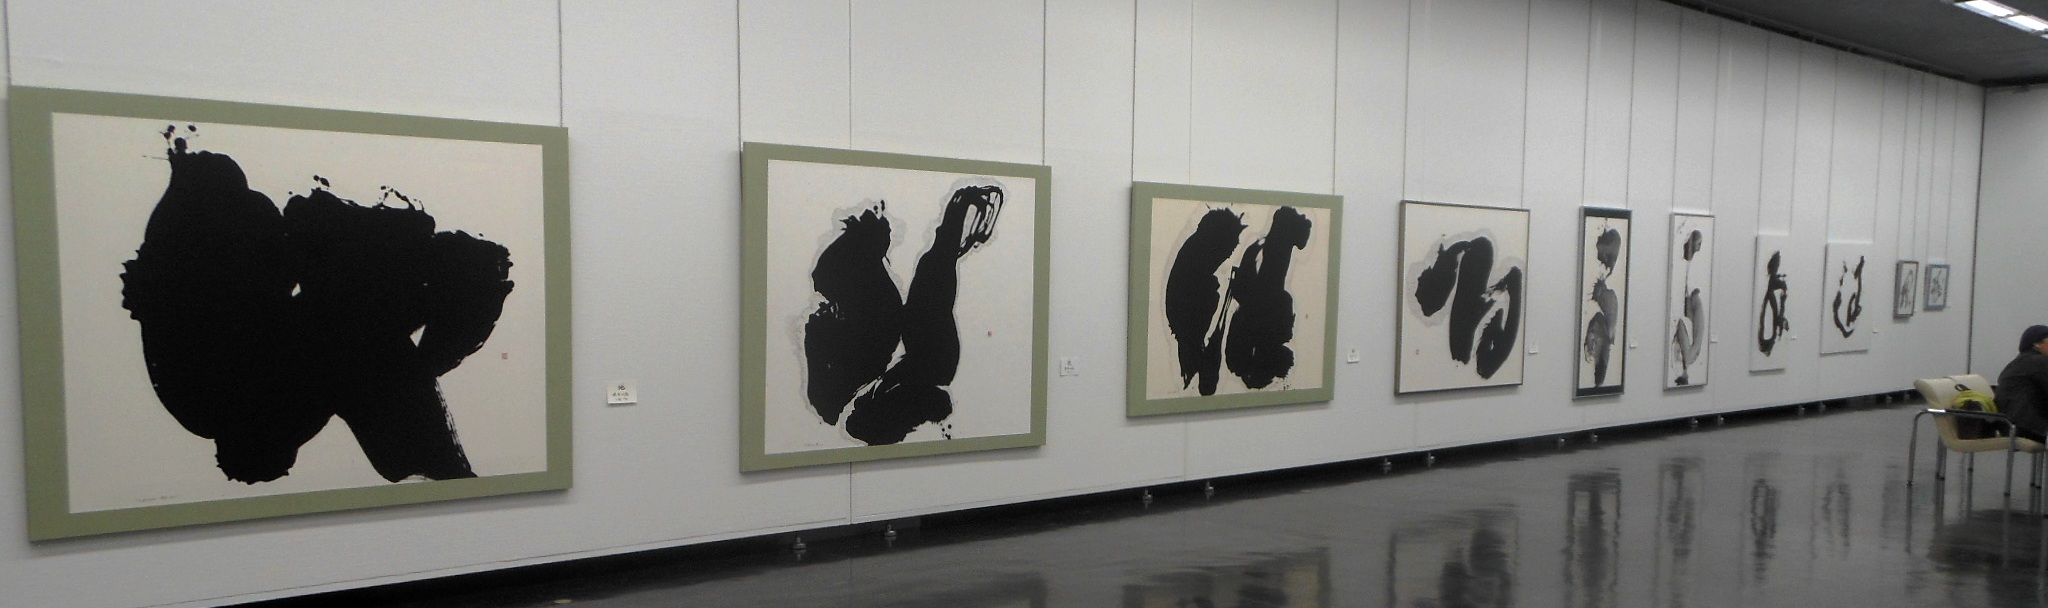 1690)「第26回 北海道墨人展」 市民ギャラリー 4月4日(水)~4月8日(日) _f0126829_1581984.jpg